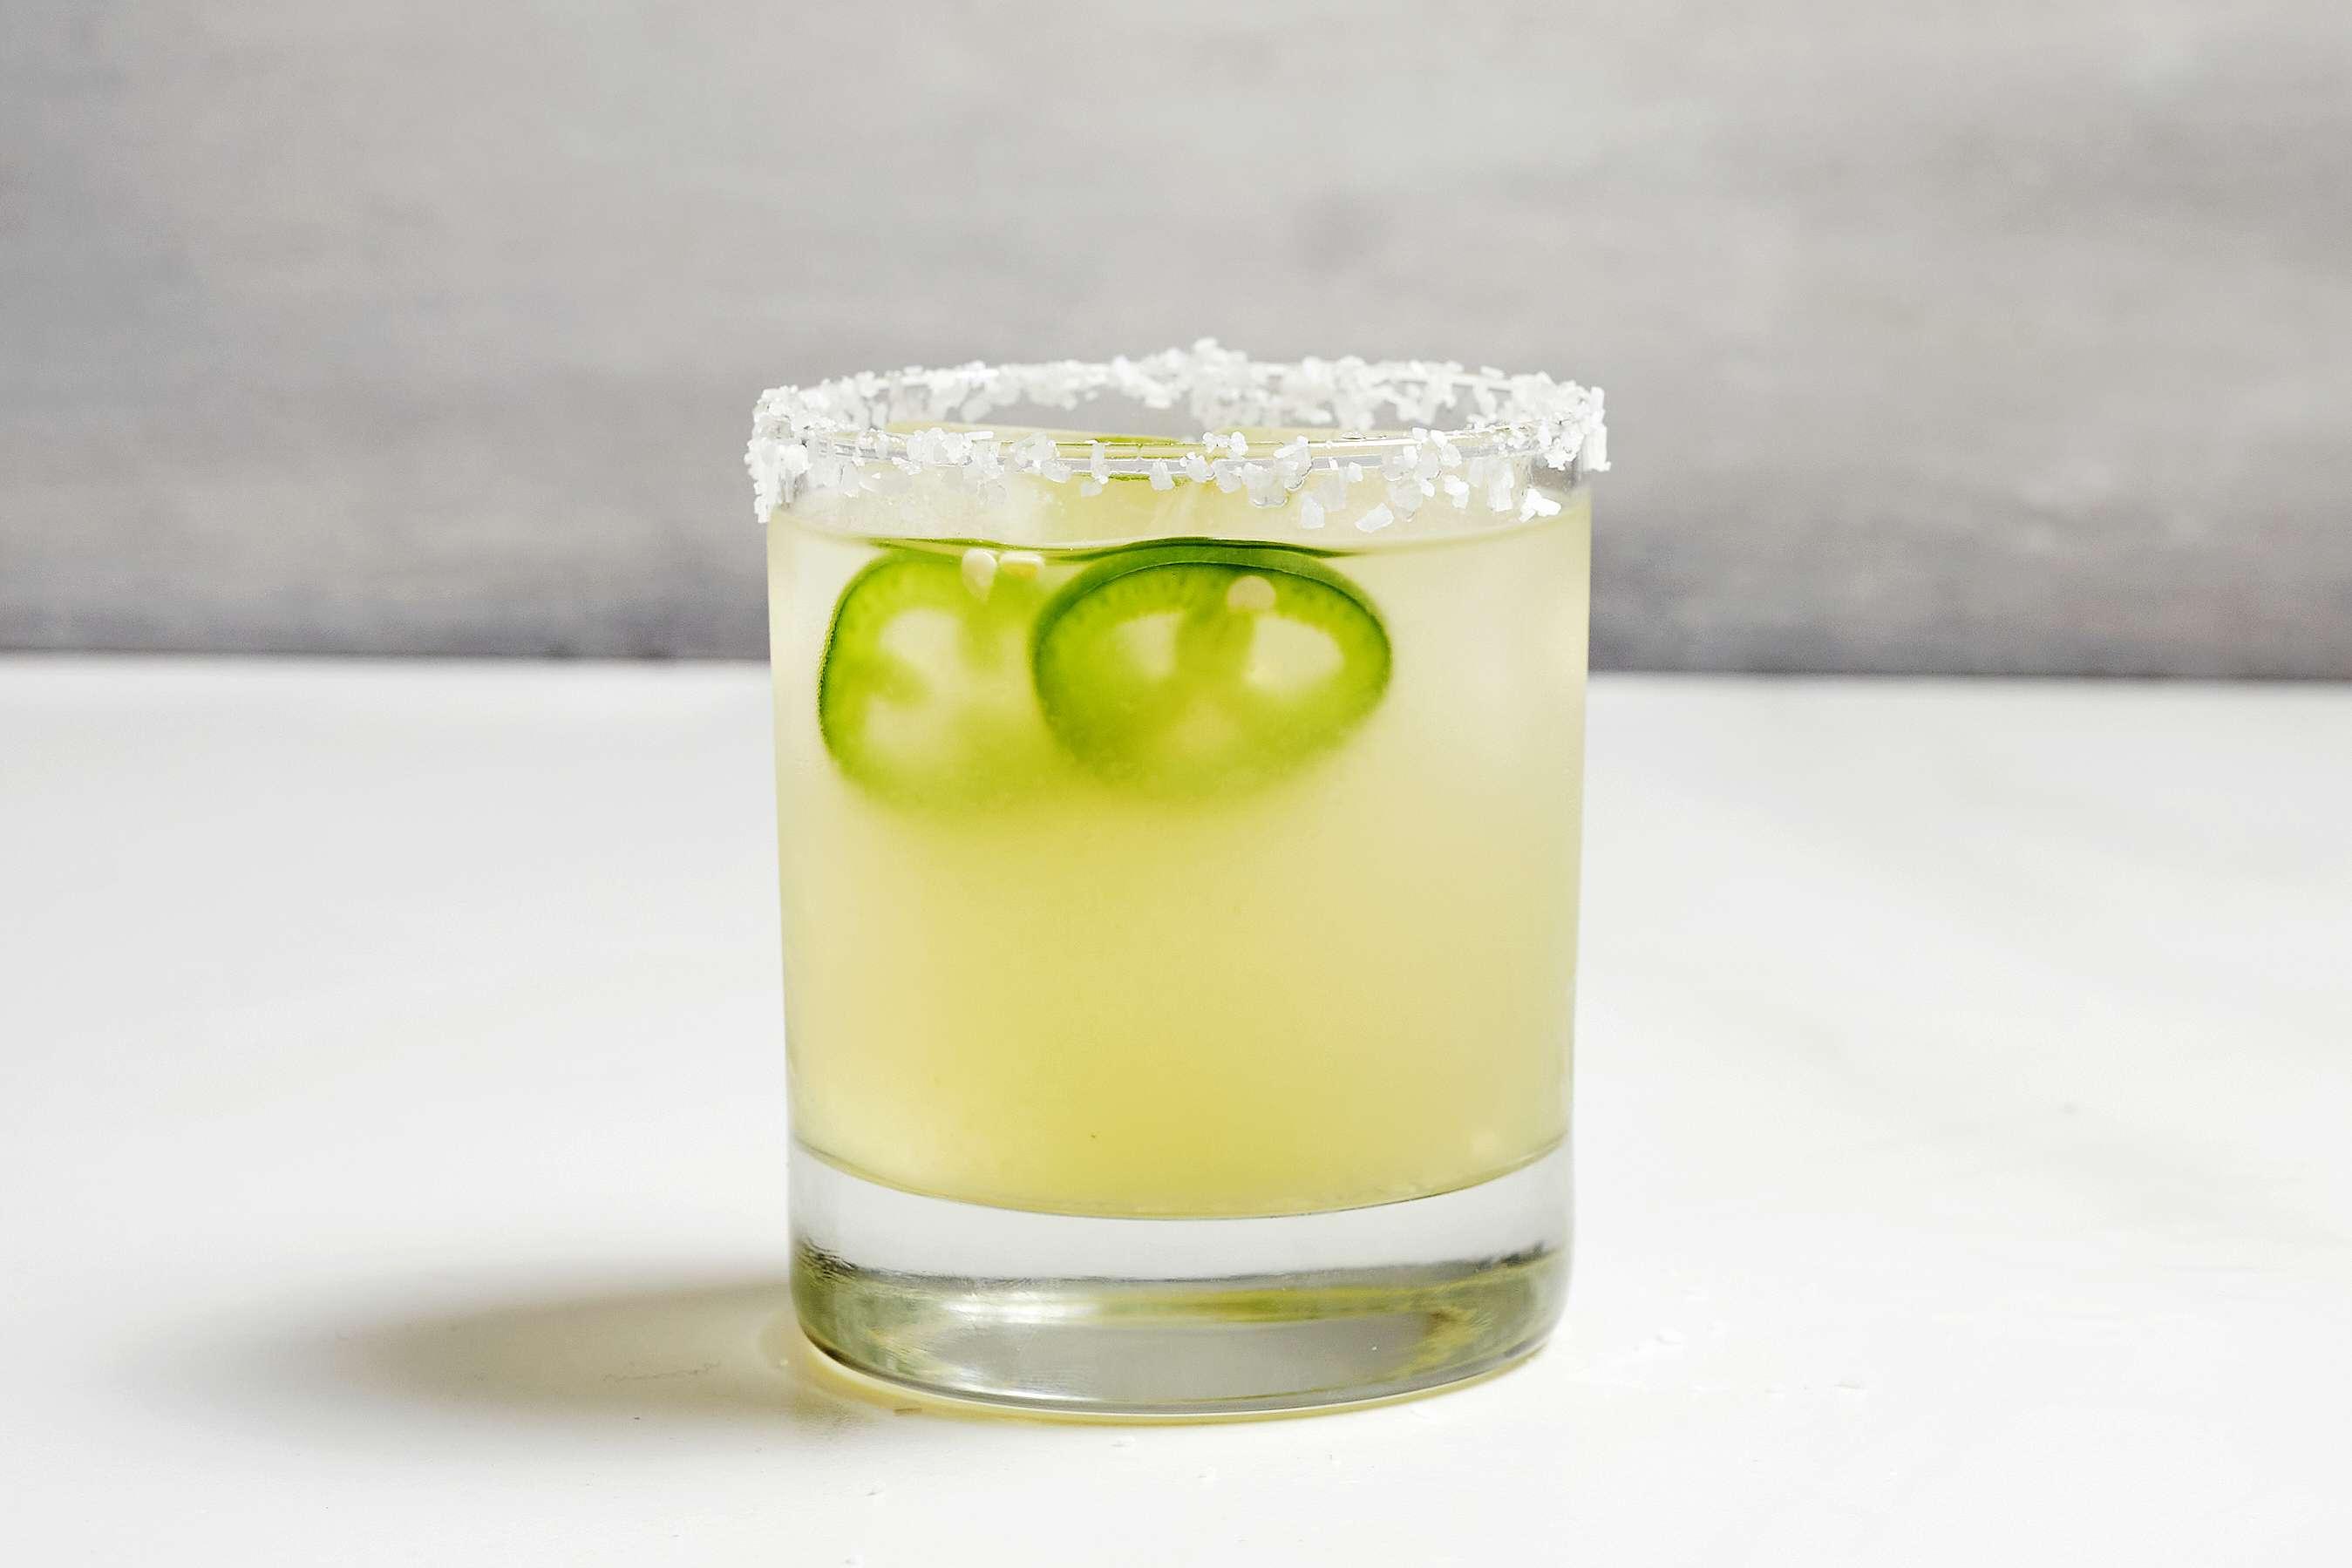 Jalapeño Margarita in a glass